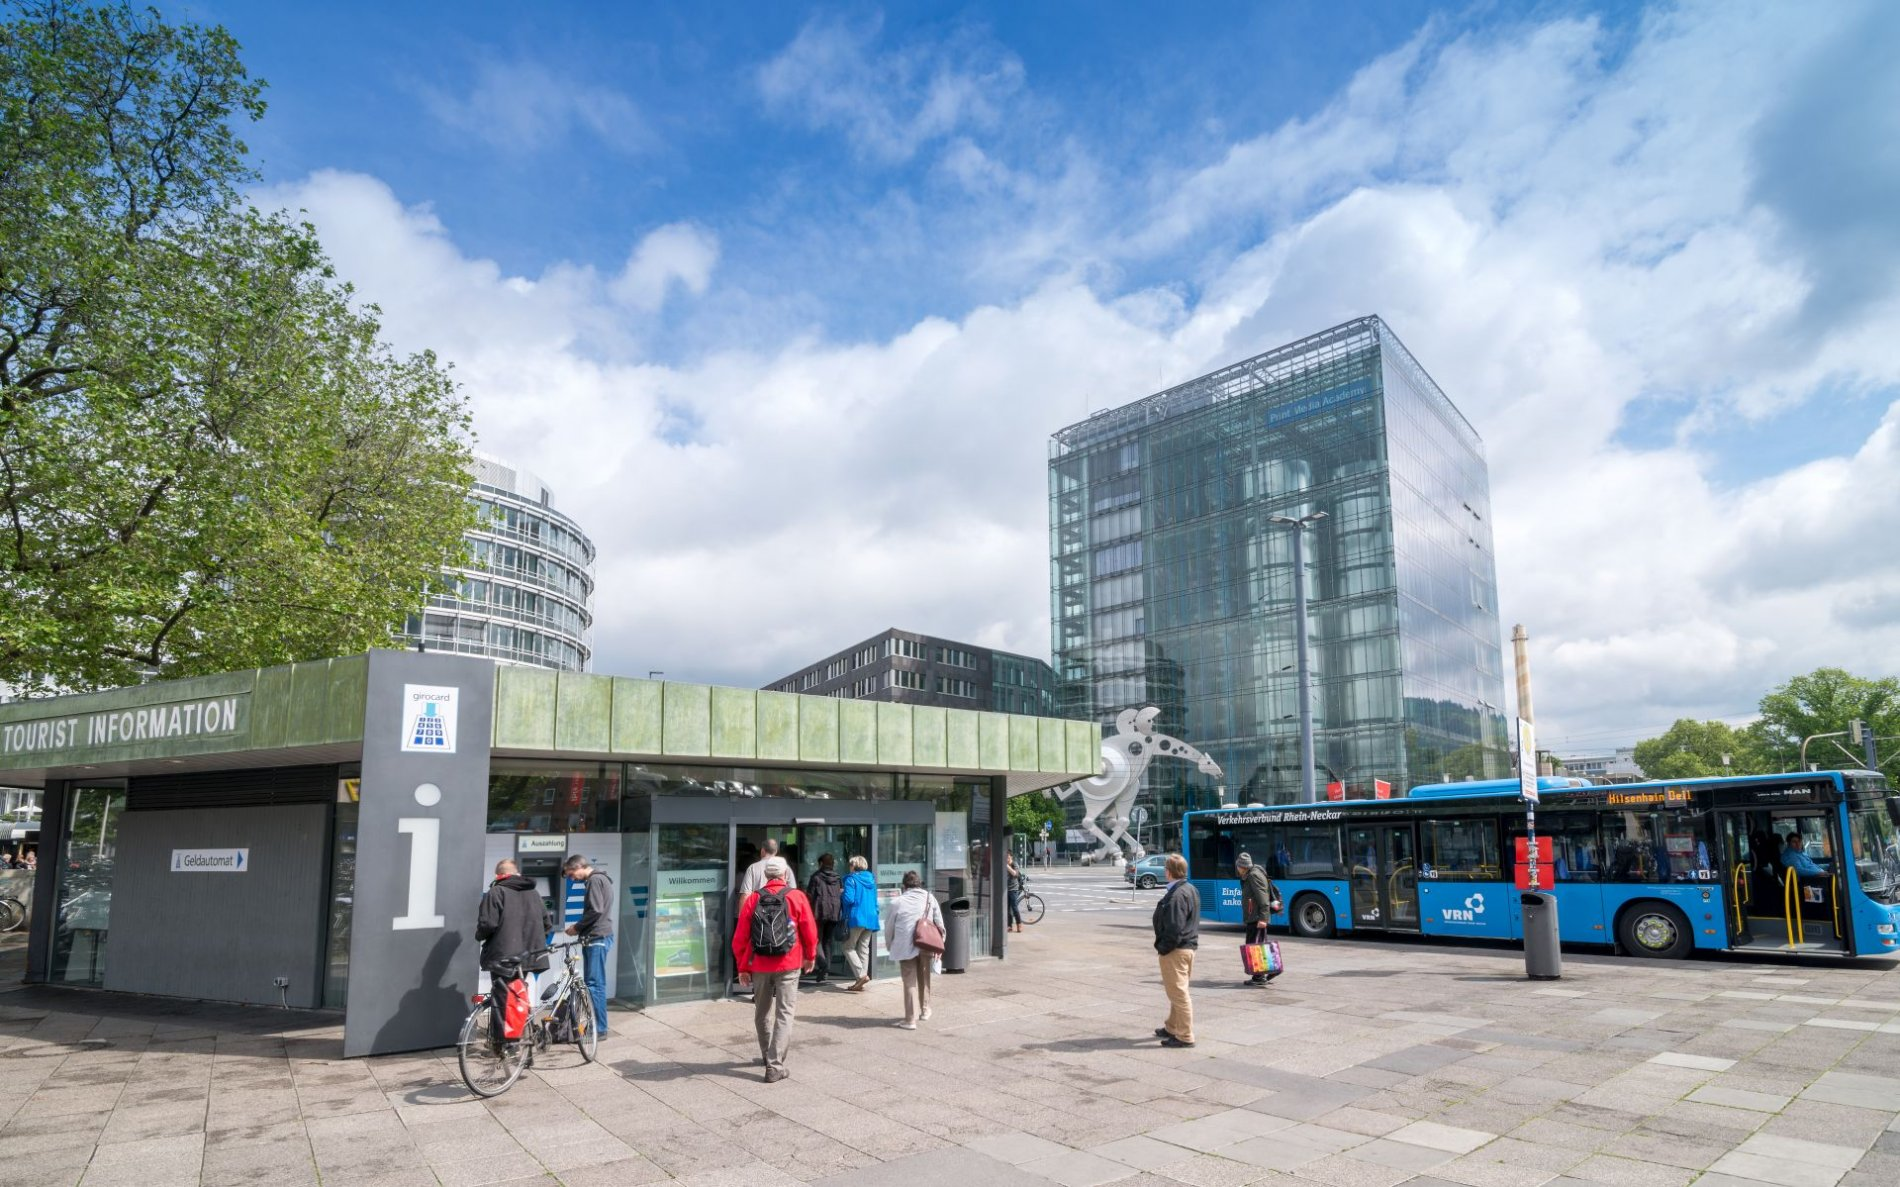 Tourist Information am Hauptbahnhof